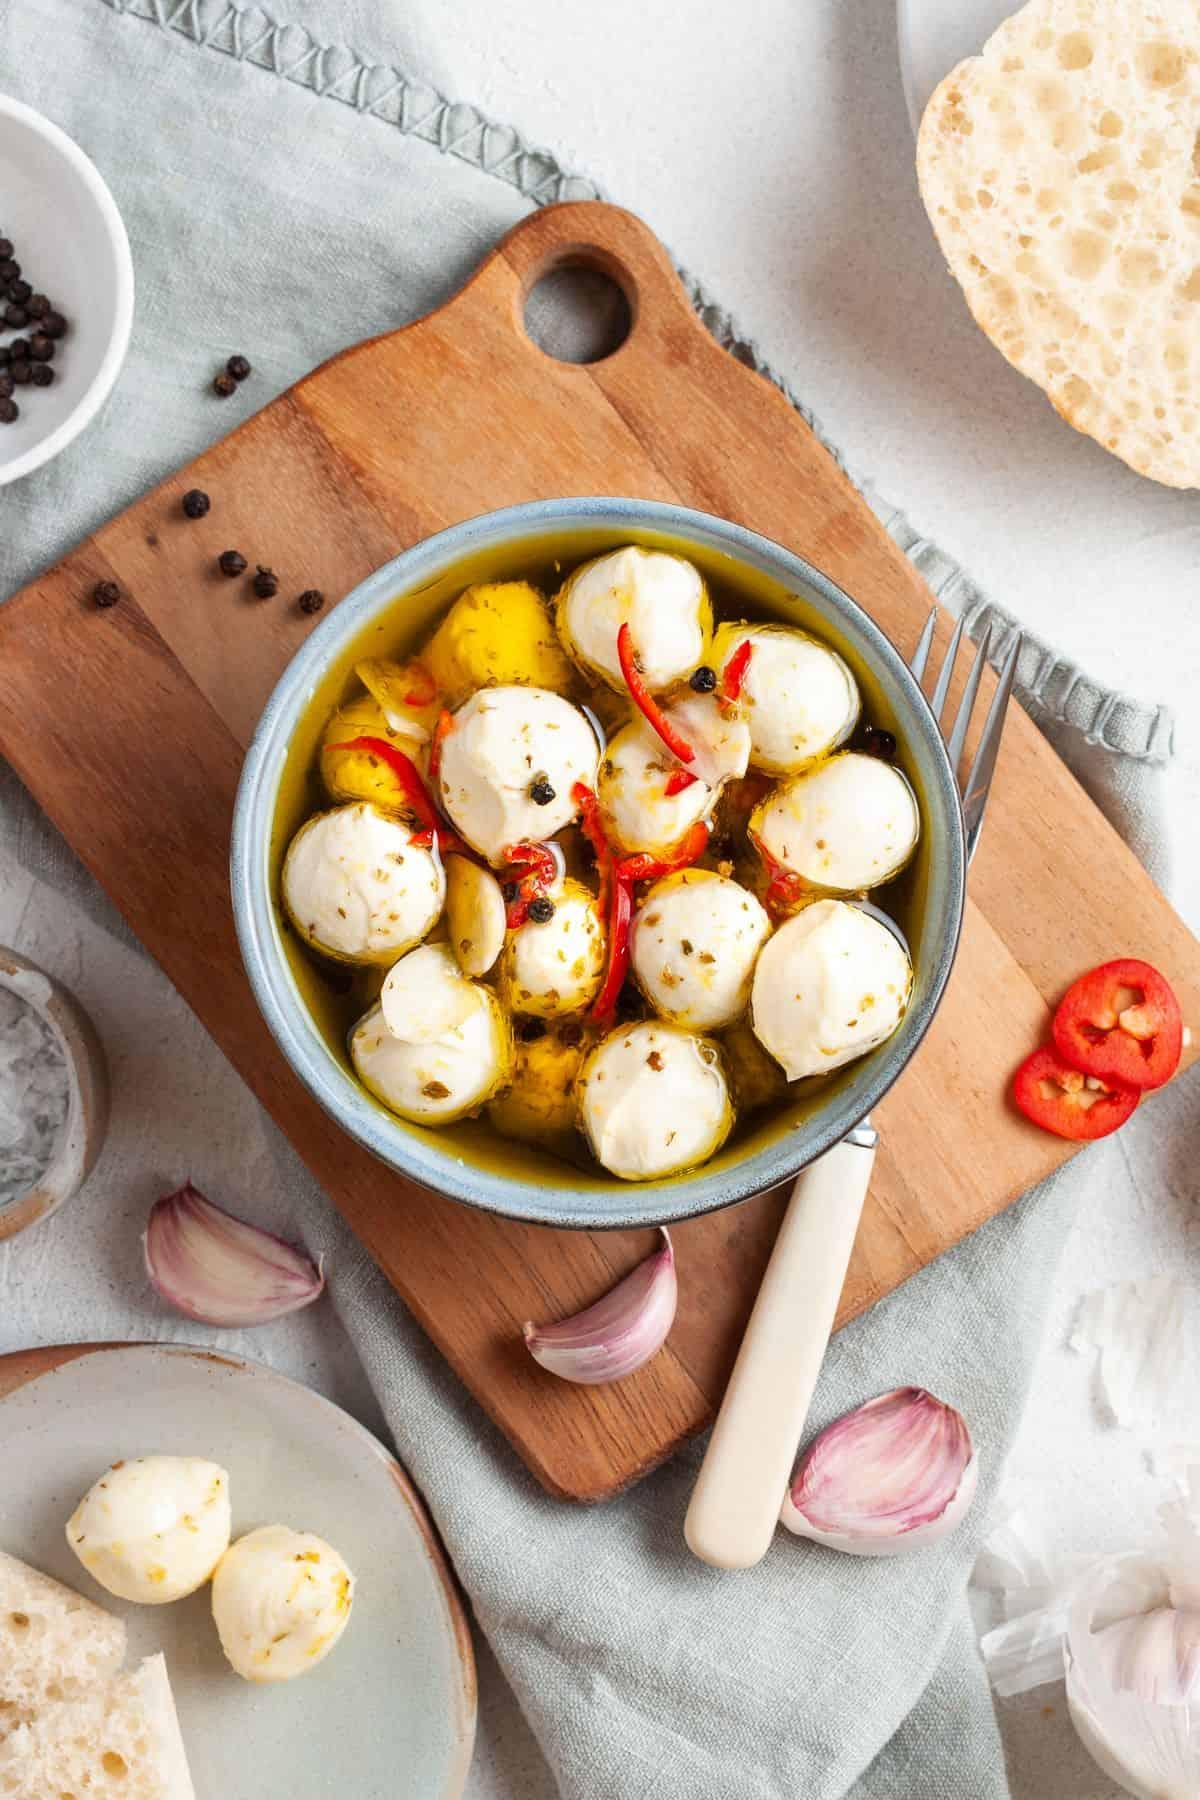 Overhead shot of bowl of mozzarella balls ready to serve.